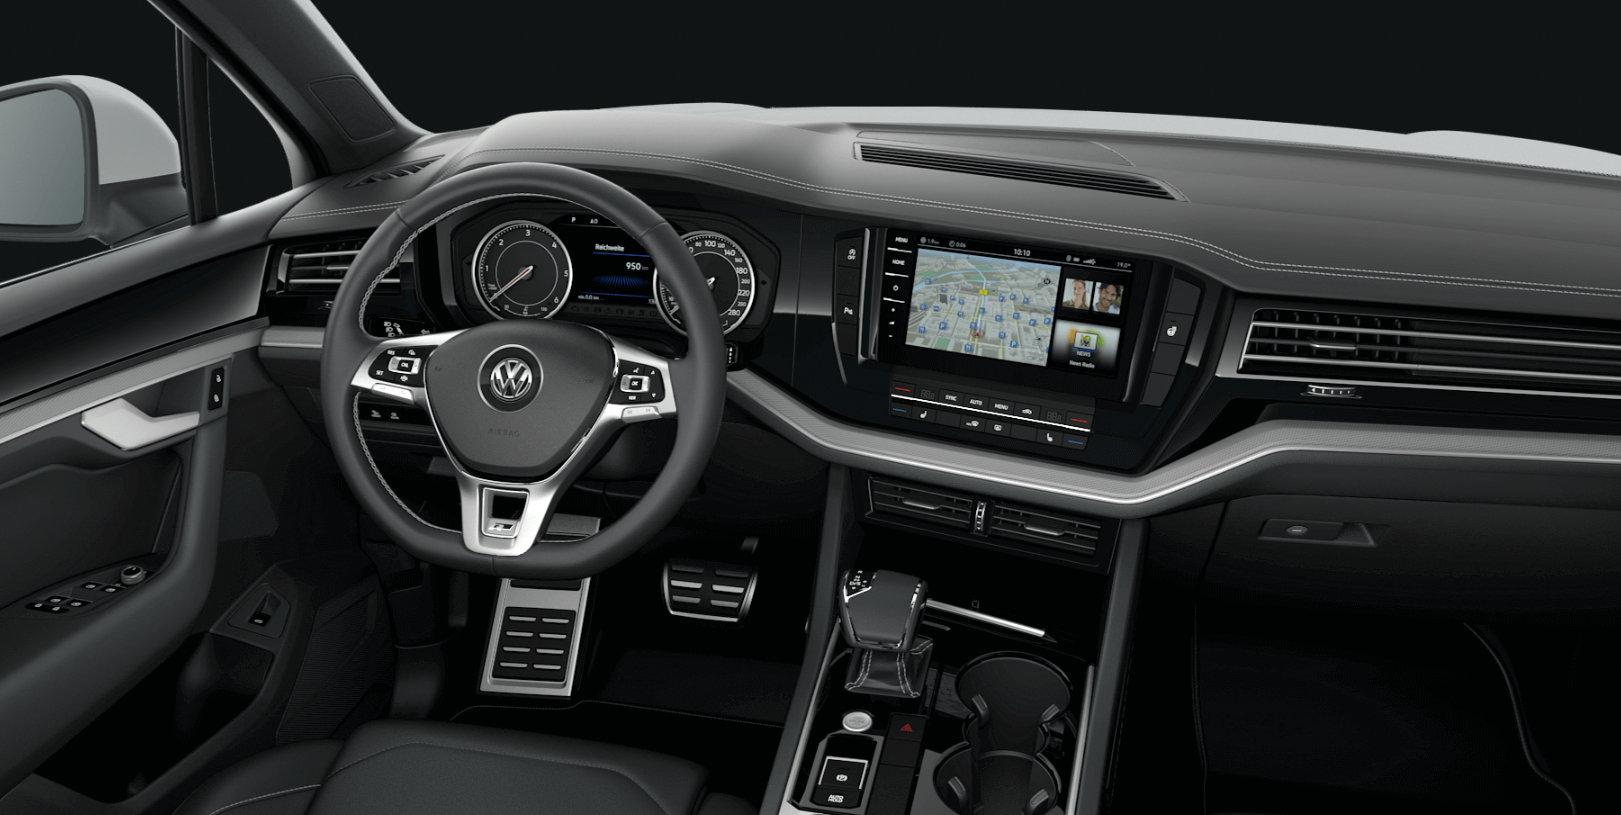 Volkswagen-Touareg-leasen-5